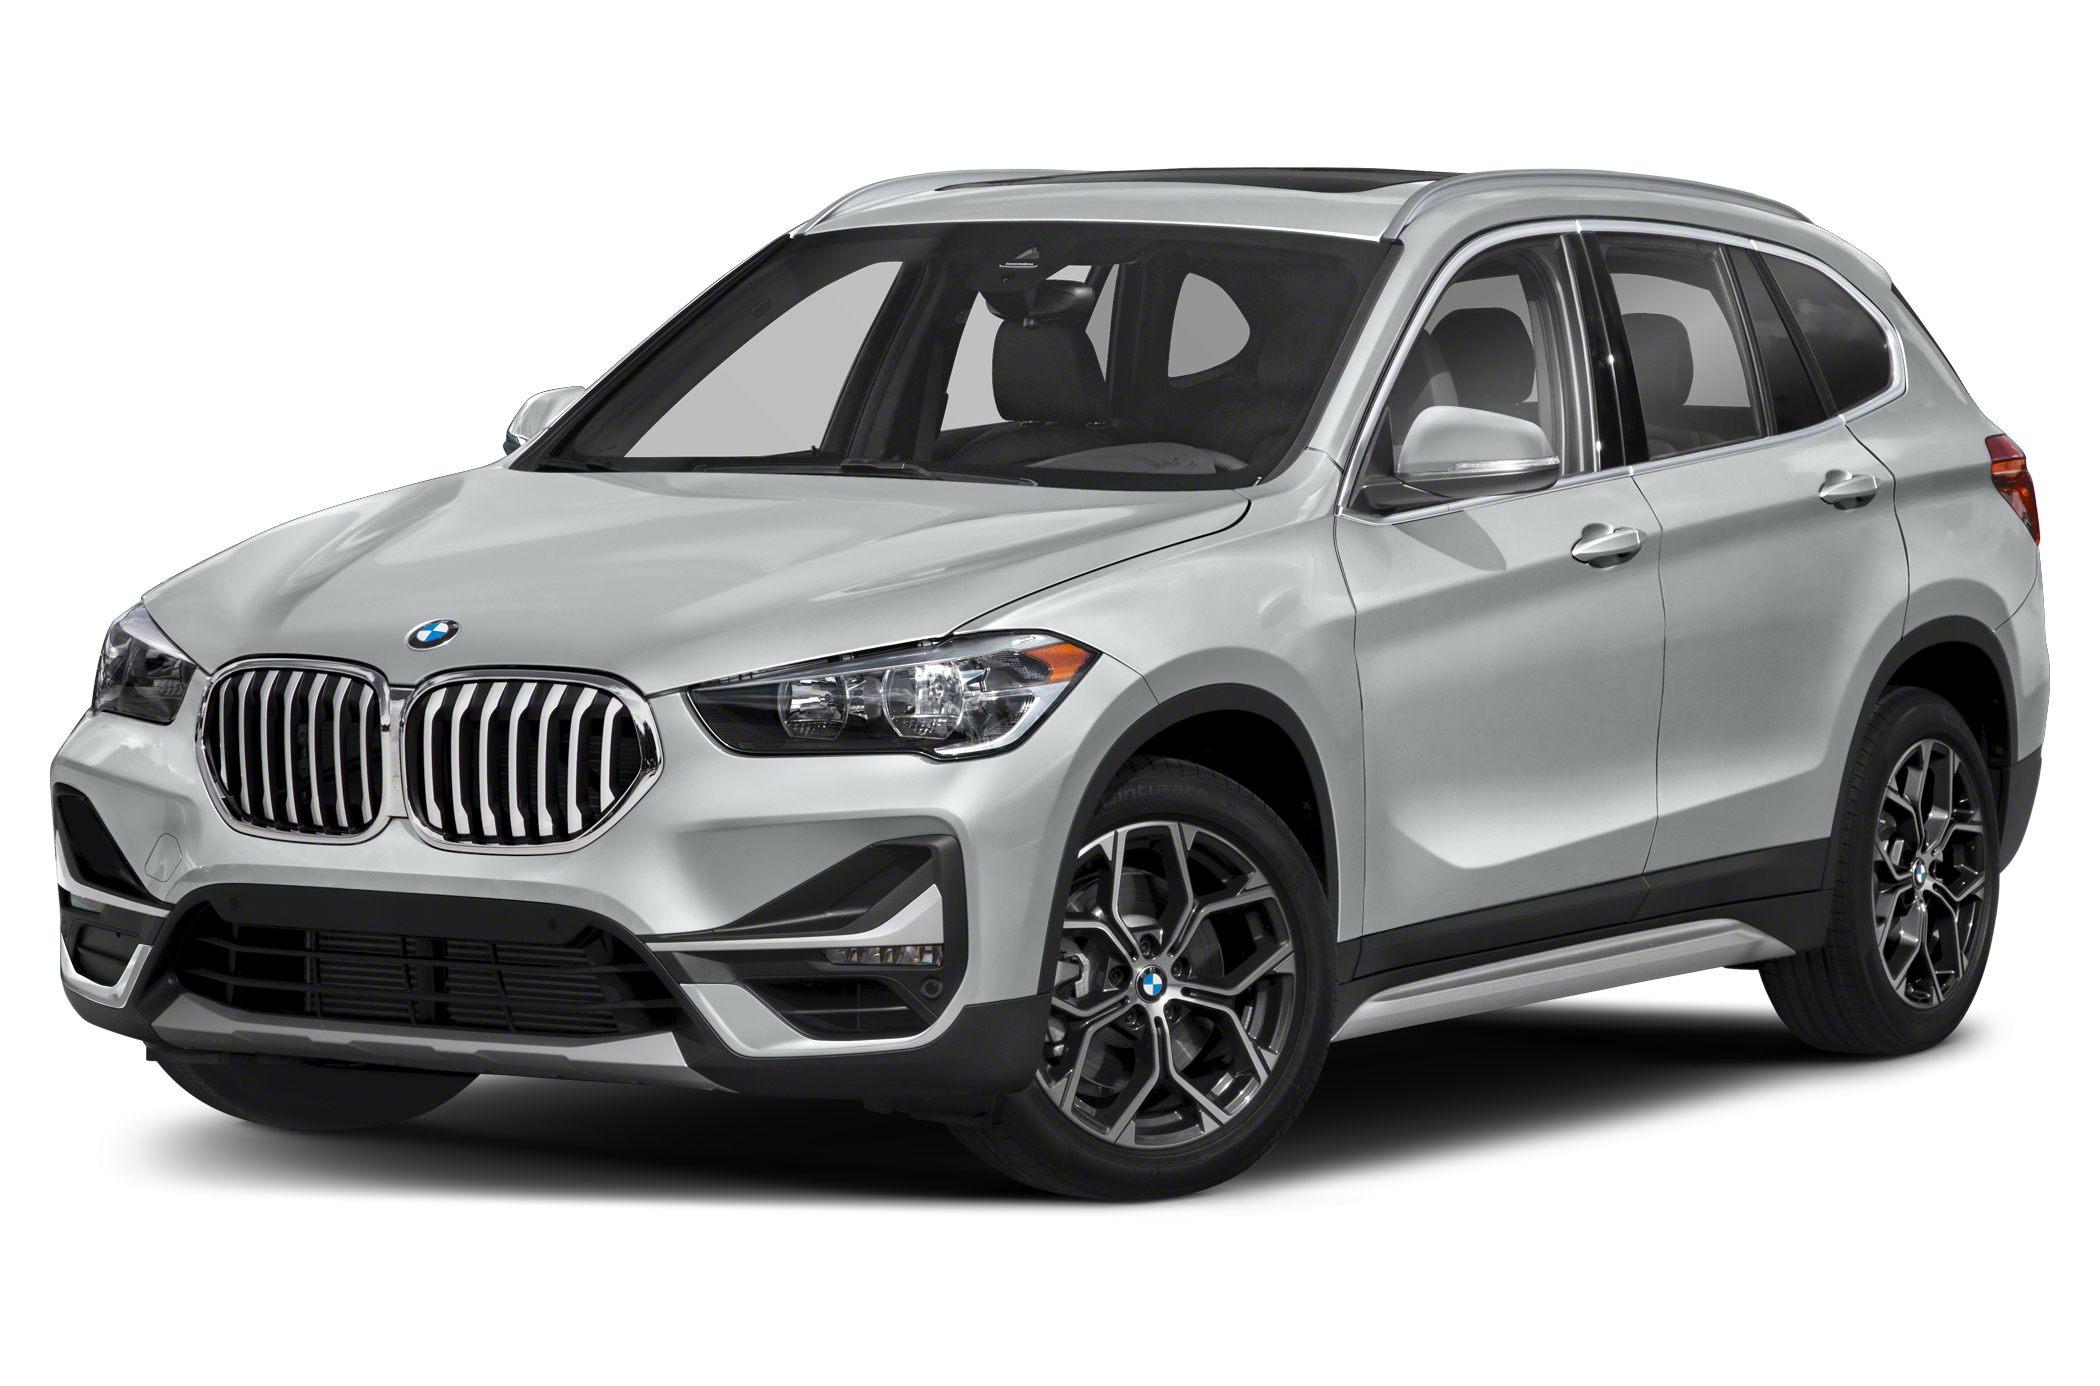 2020 BMW X1 xDrive28i 4dr All-wheel Drive Sports Activity Vehicle